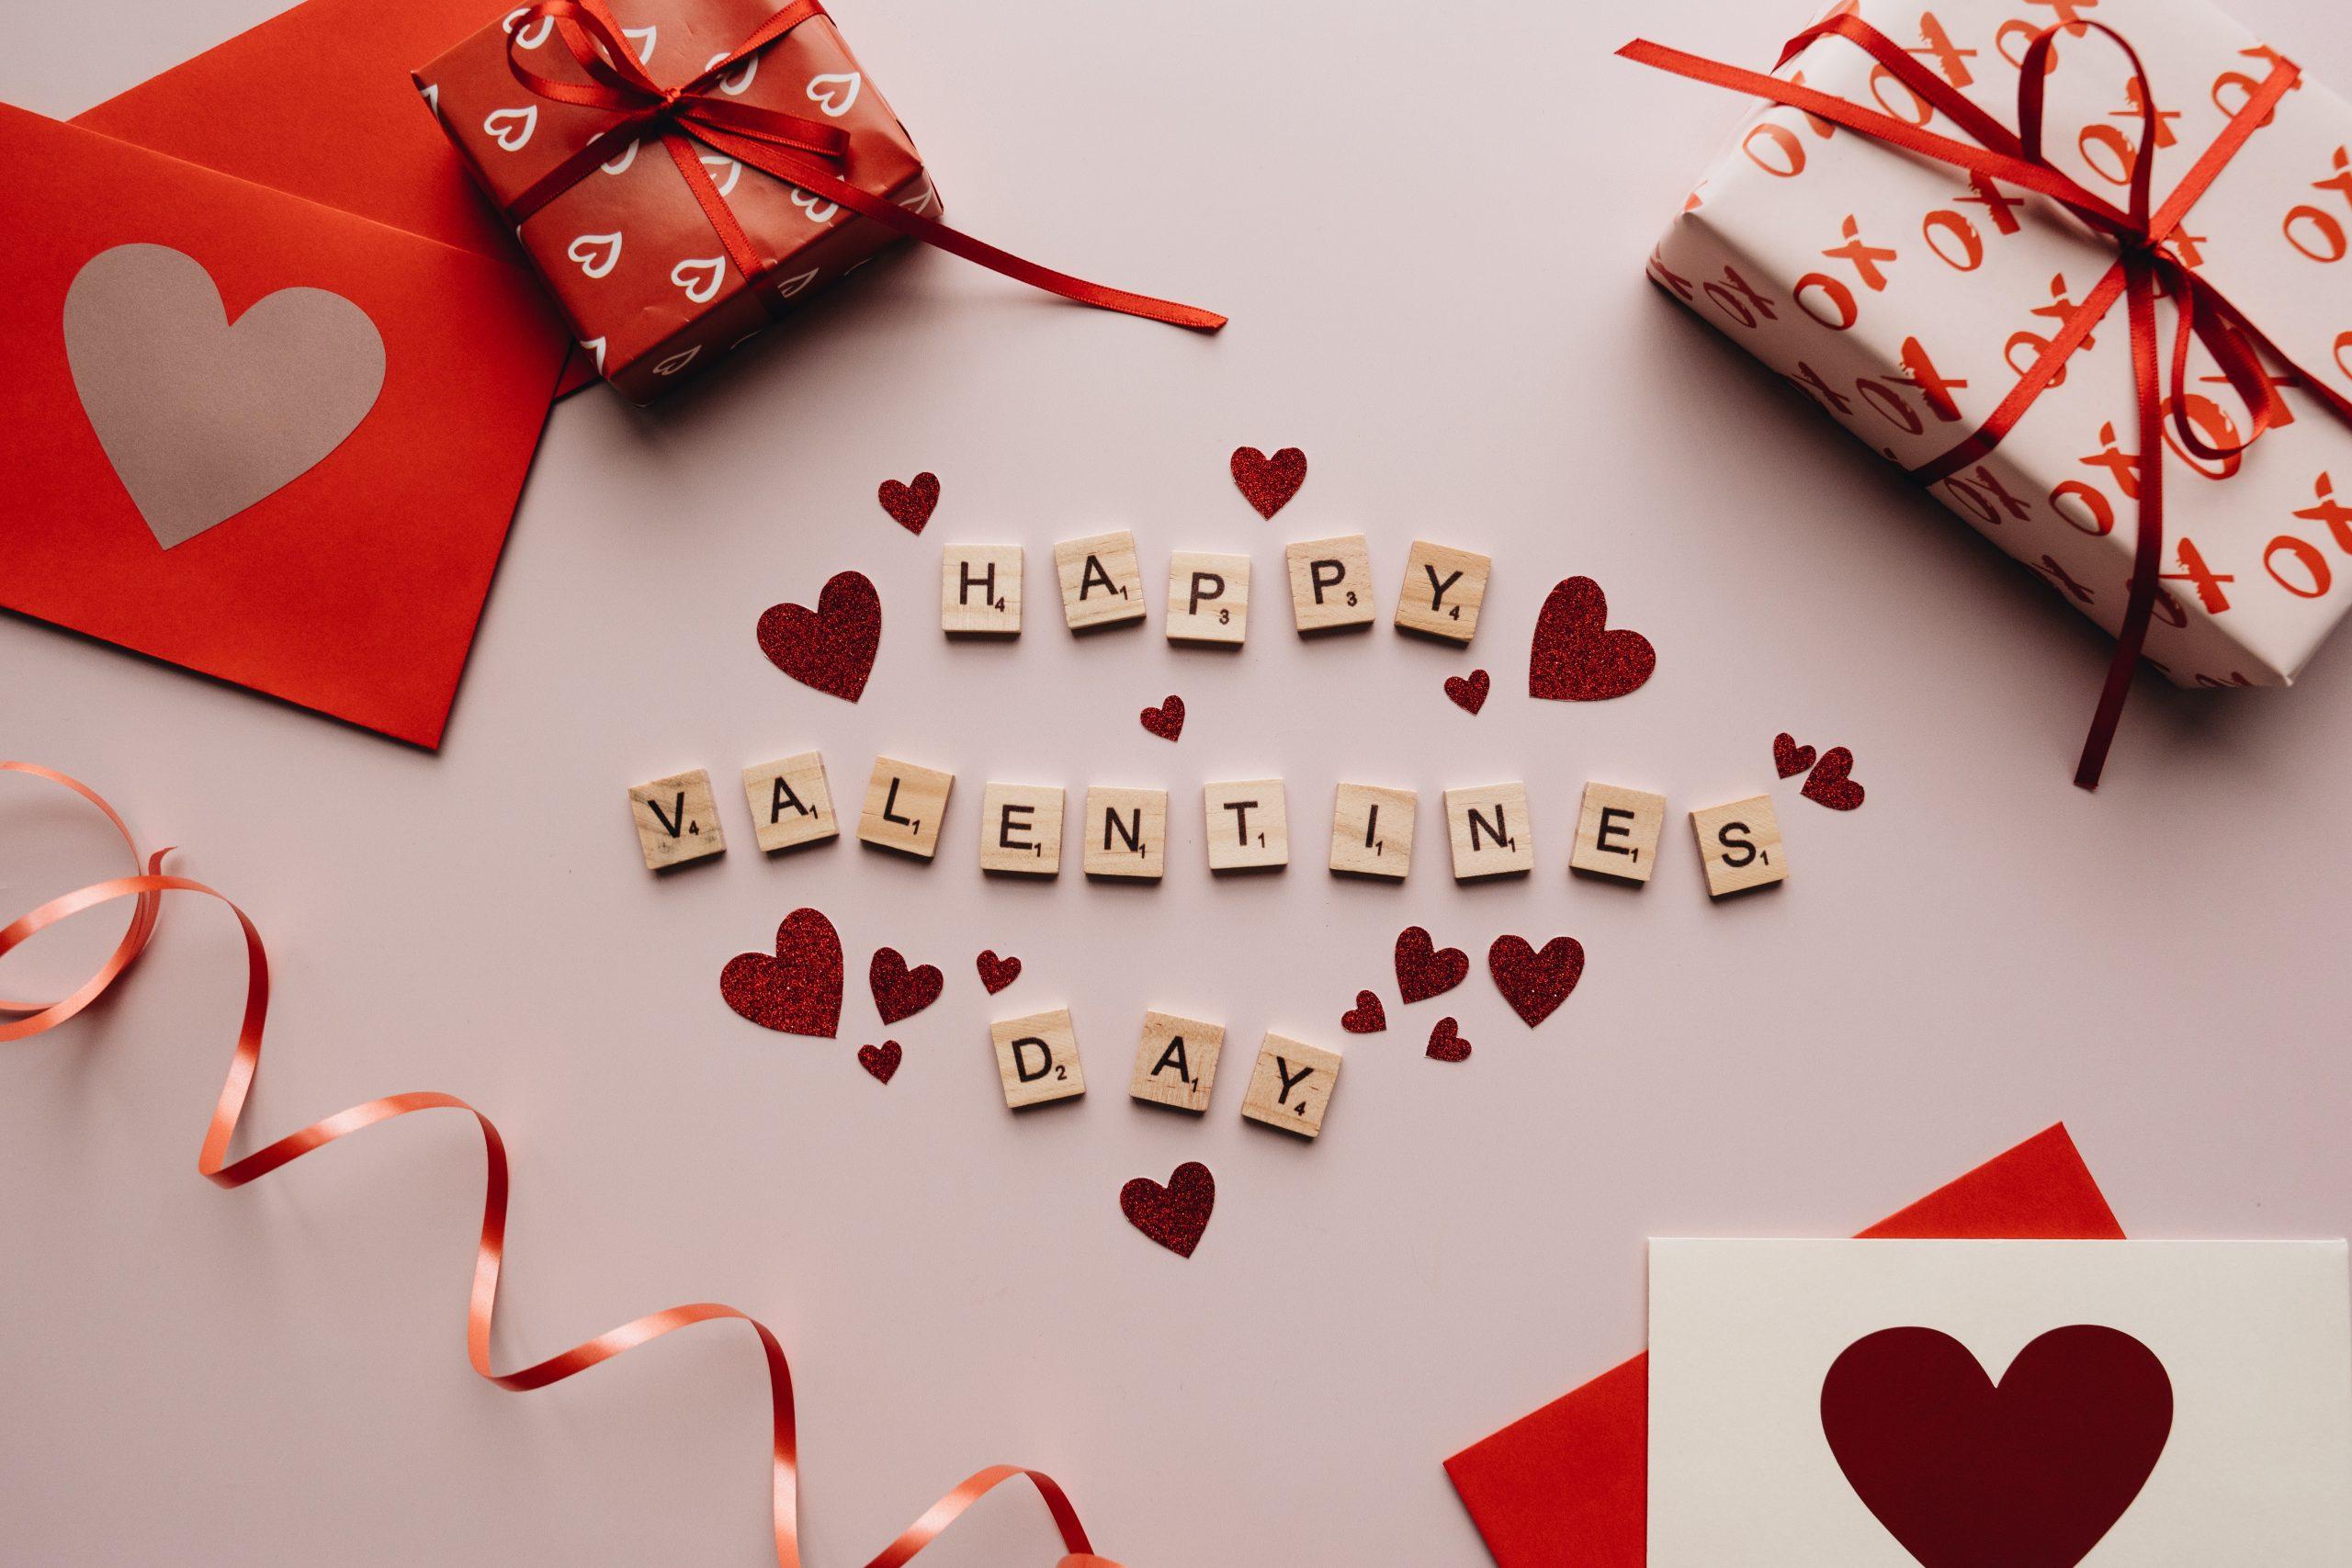 Hello Weekend! February 12th – 14th